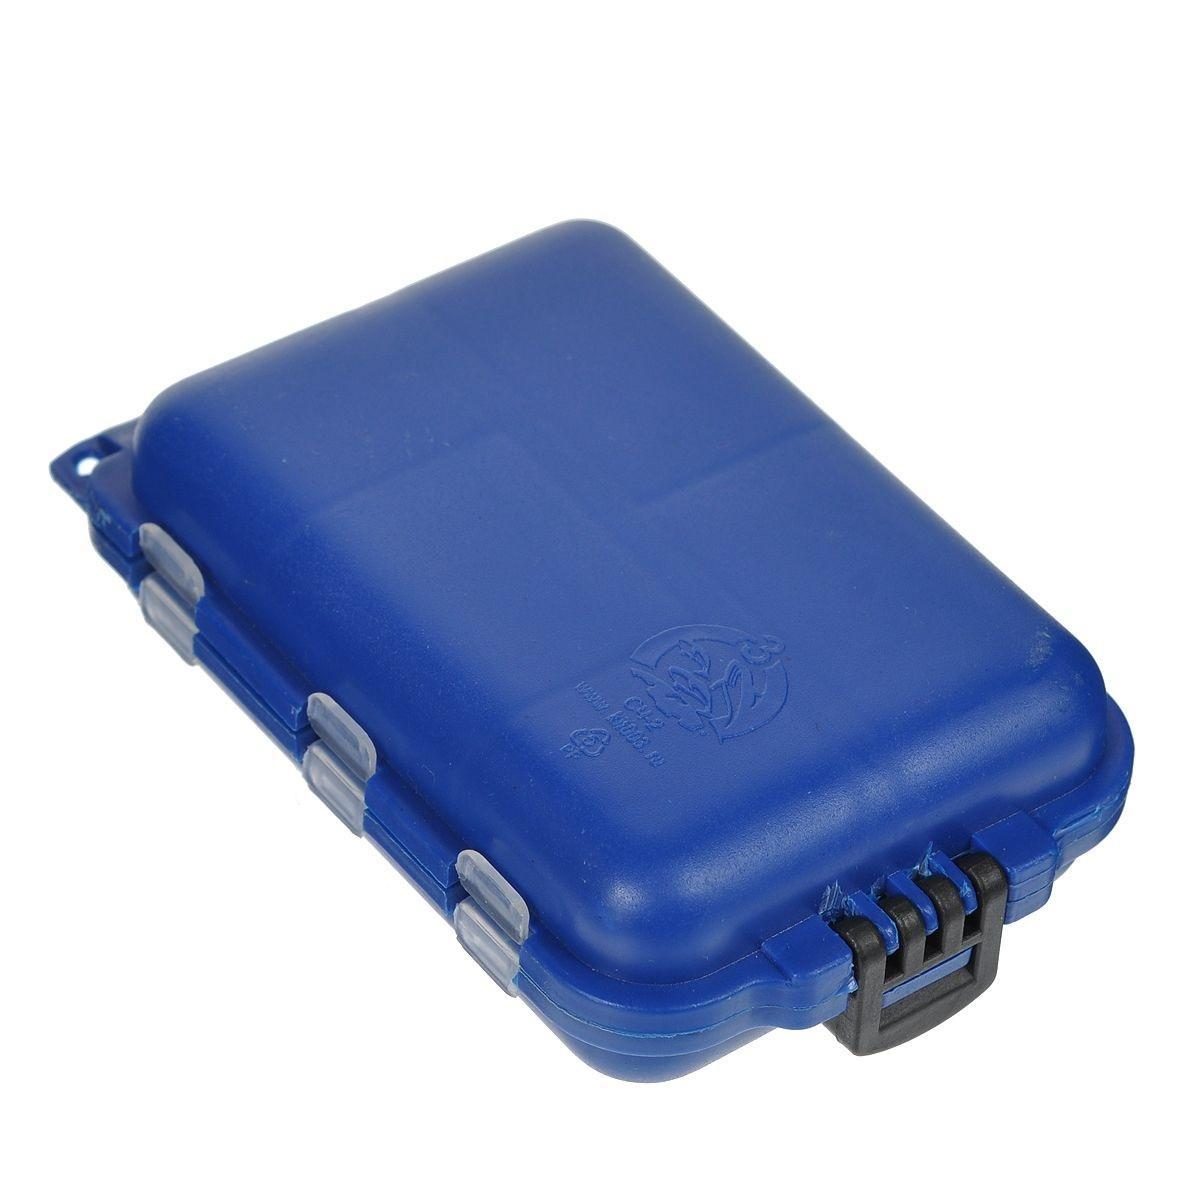 Органайзер для мелочей, двухсторонний, 9,5 х 6 х 2,5 см, цвет в ассортименте 679531